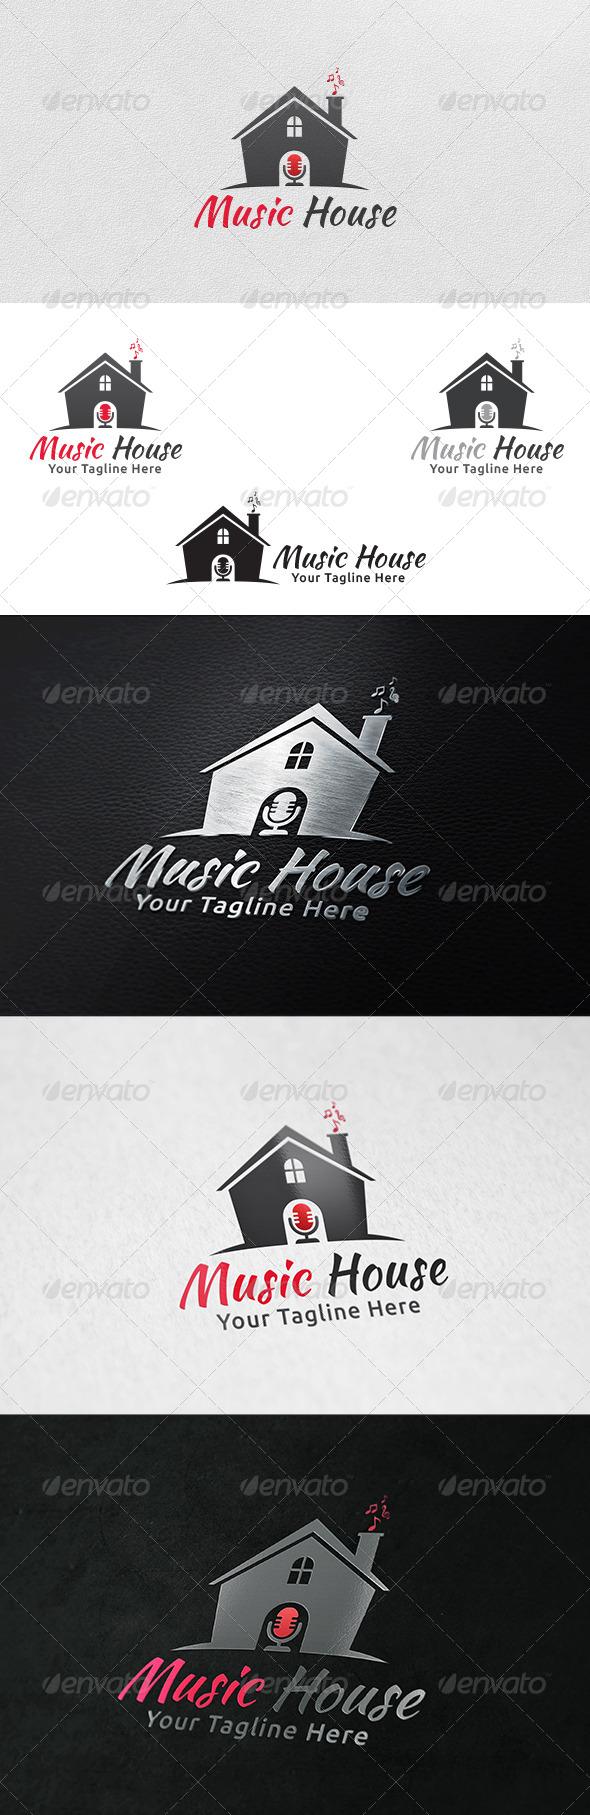 Music House - Logo Template - Symbols Logo Templates